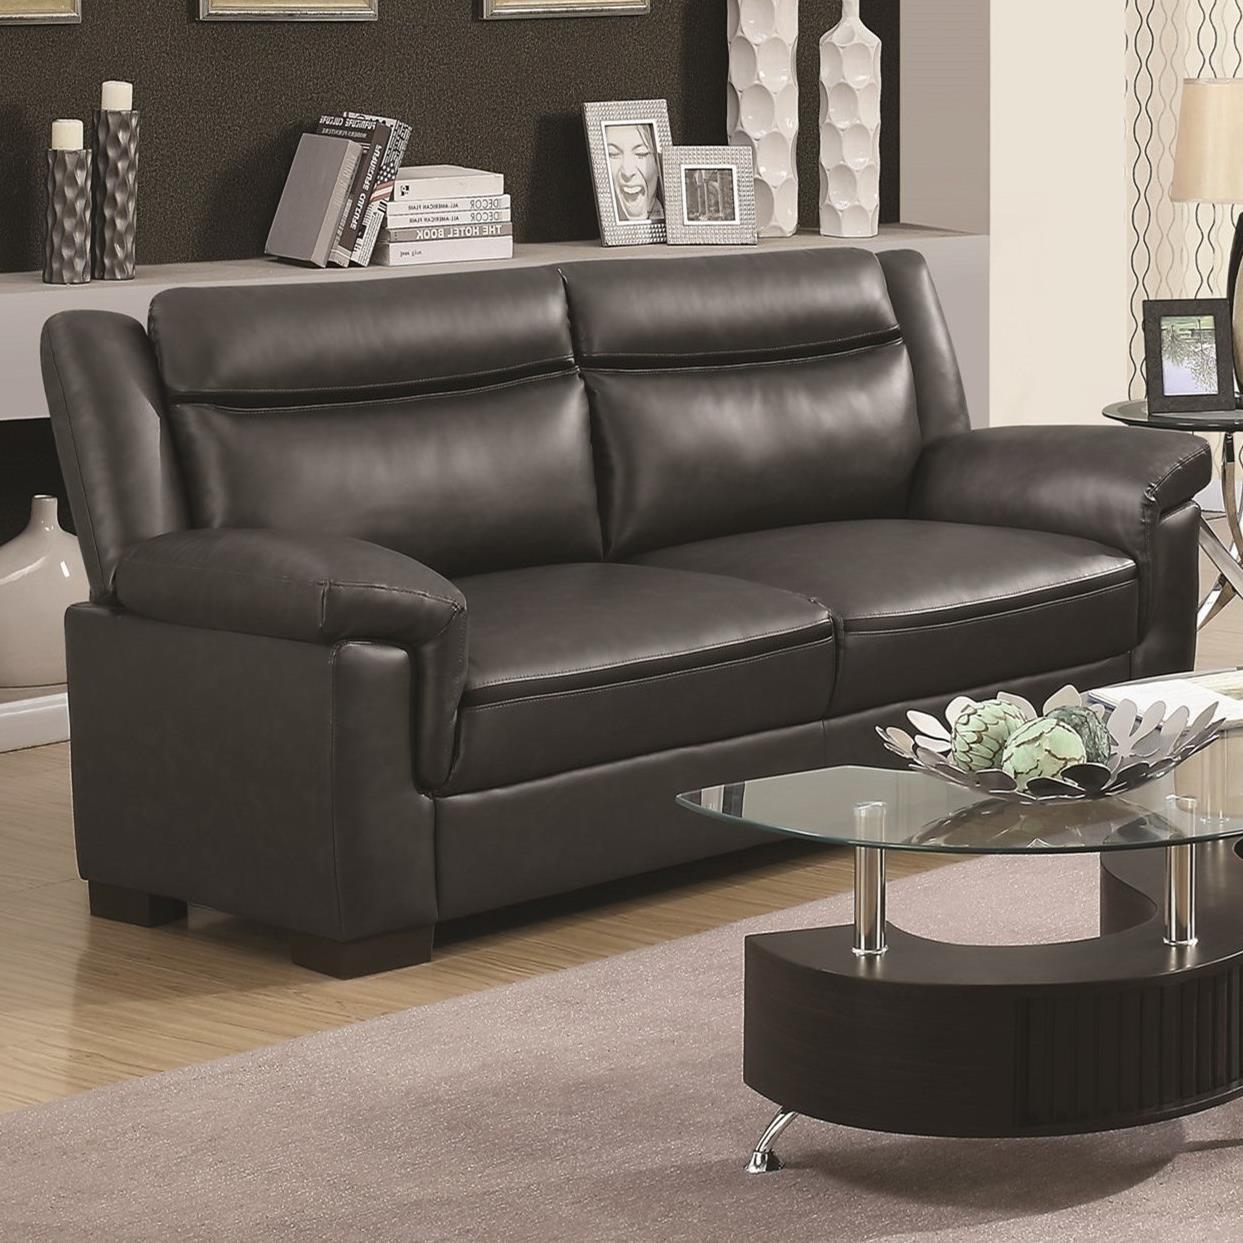 Arabella Sofa by Coaster at Rife's Home Furniture